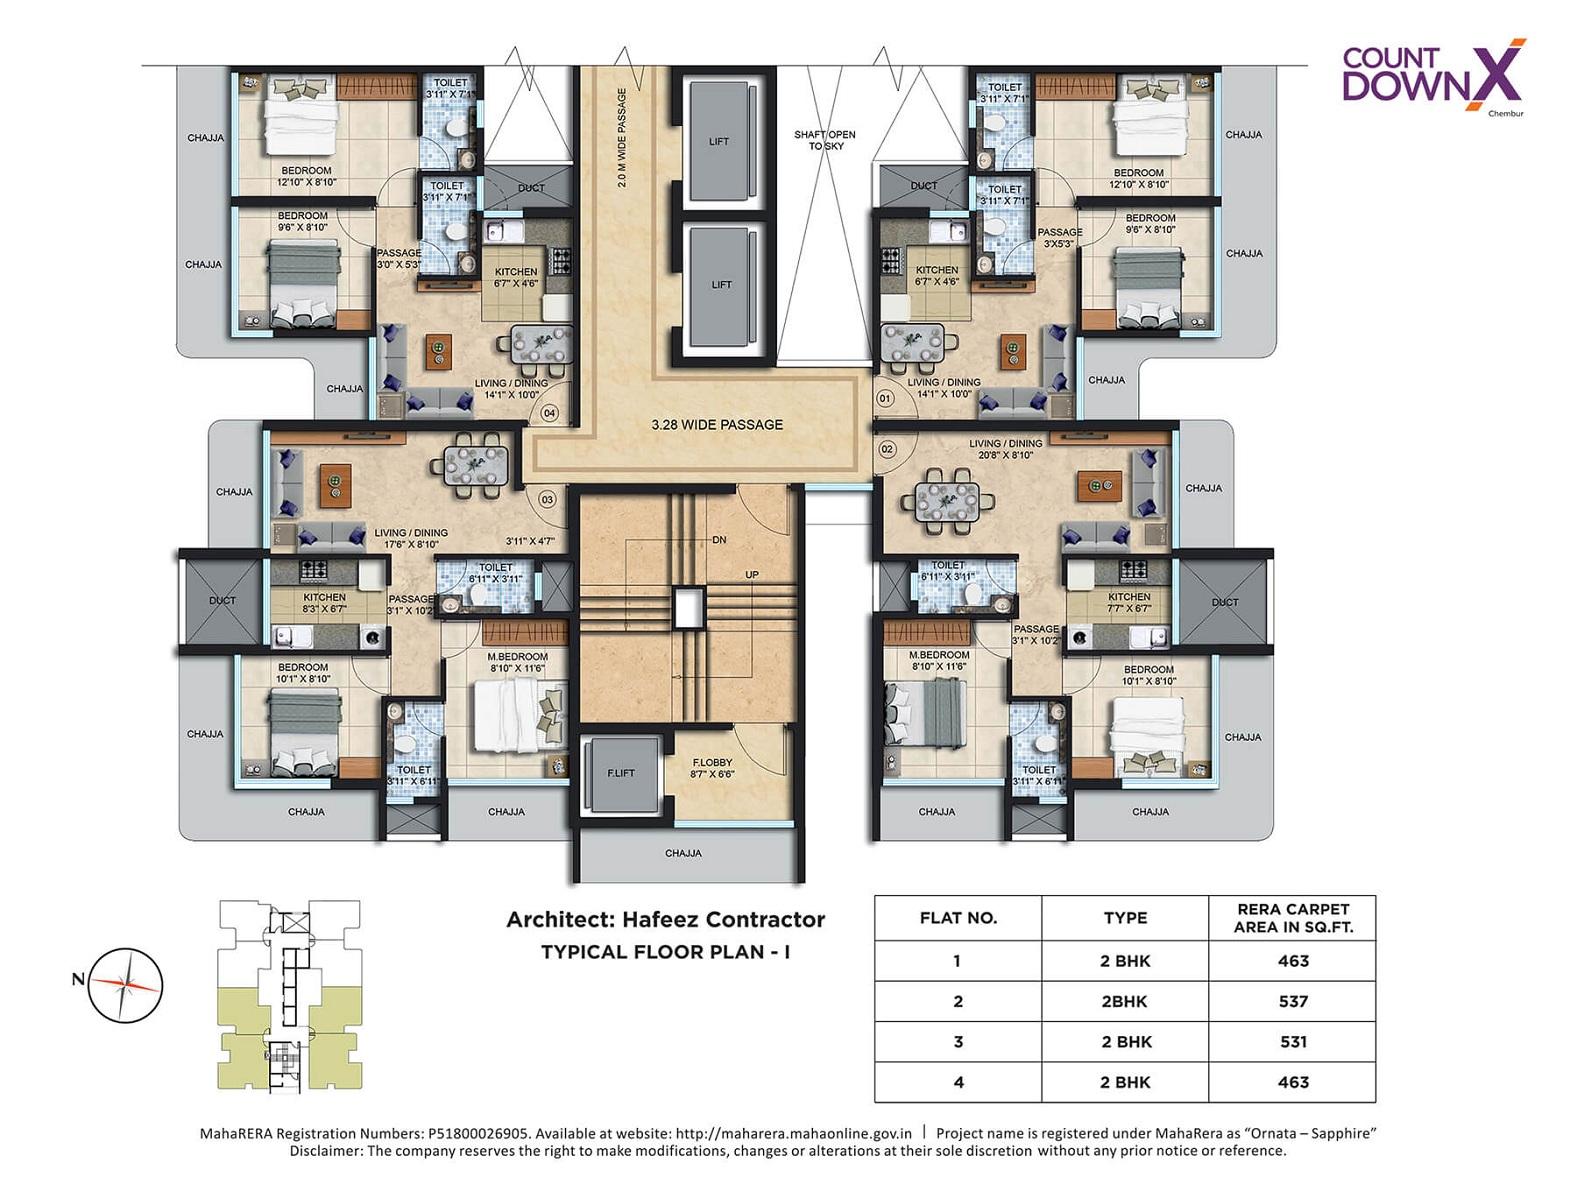 spenta ornata sapphire project floor plans1